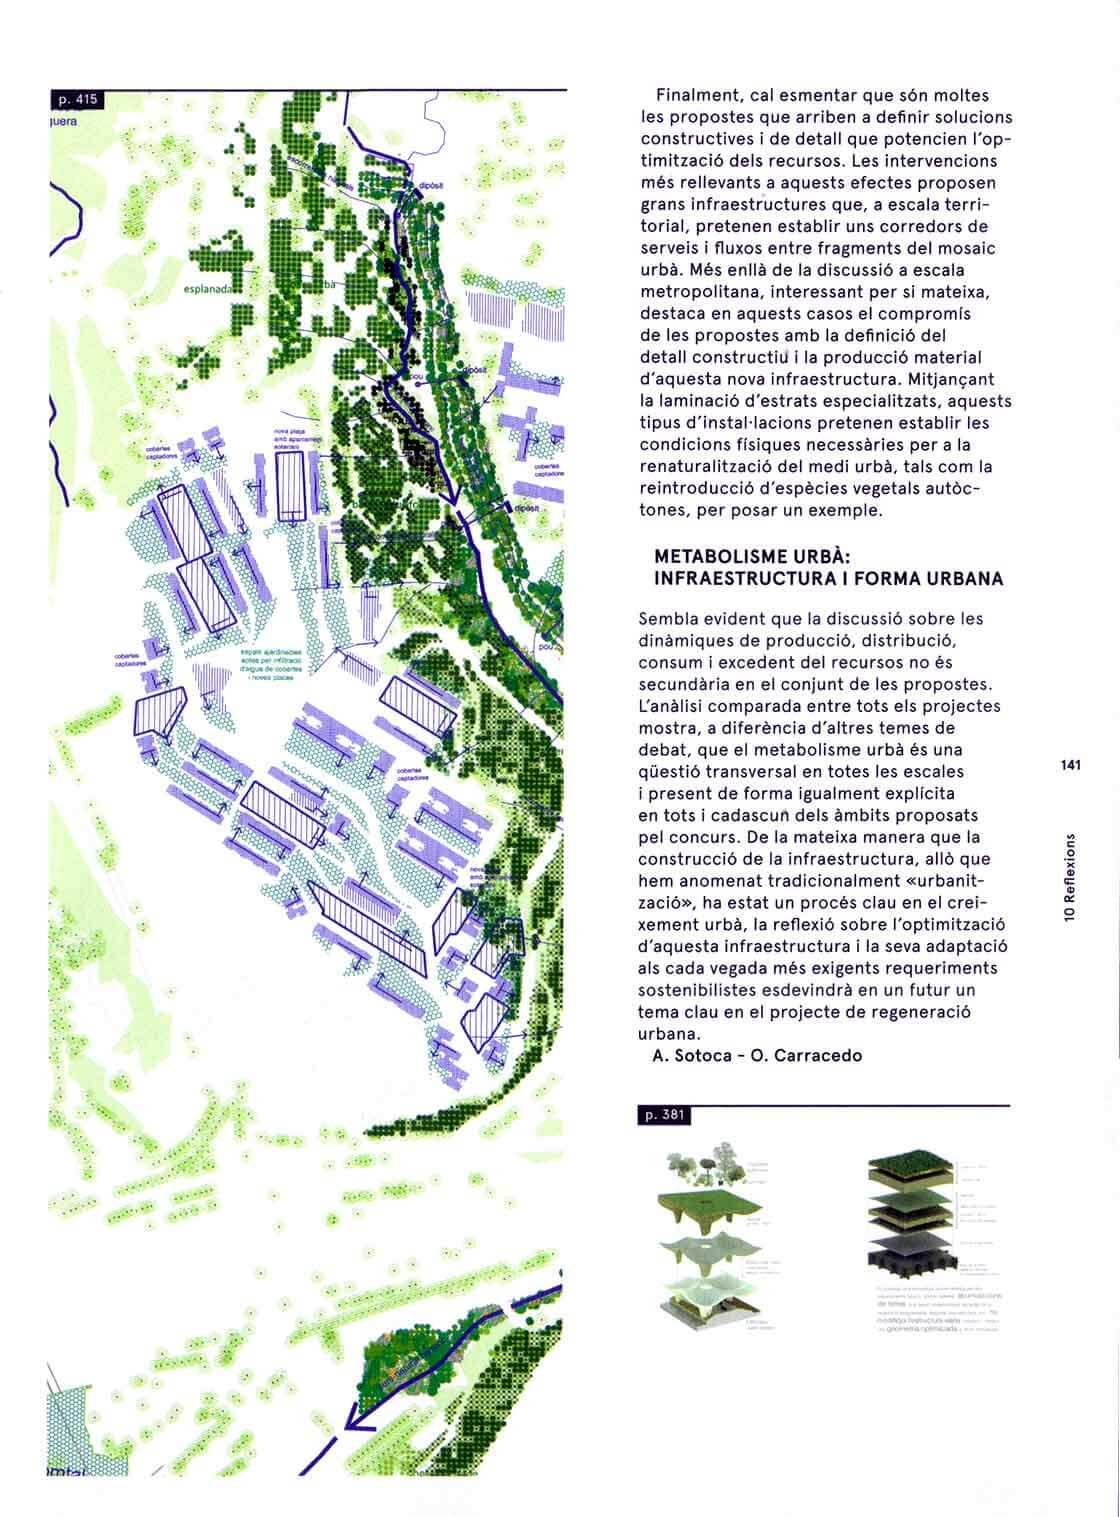 Naturbà - página 141 @Marc García-Durán, arquitecto